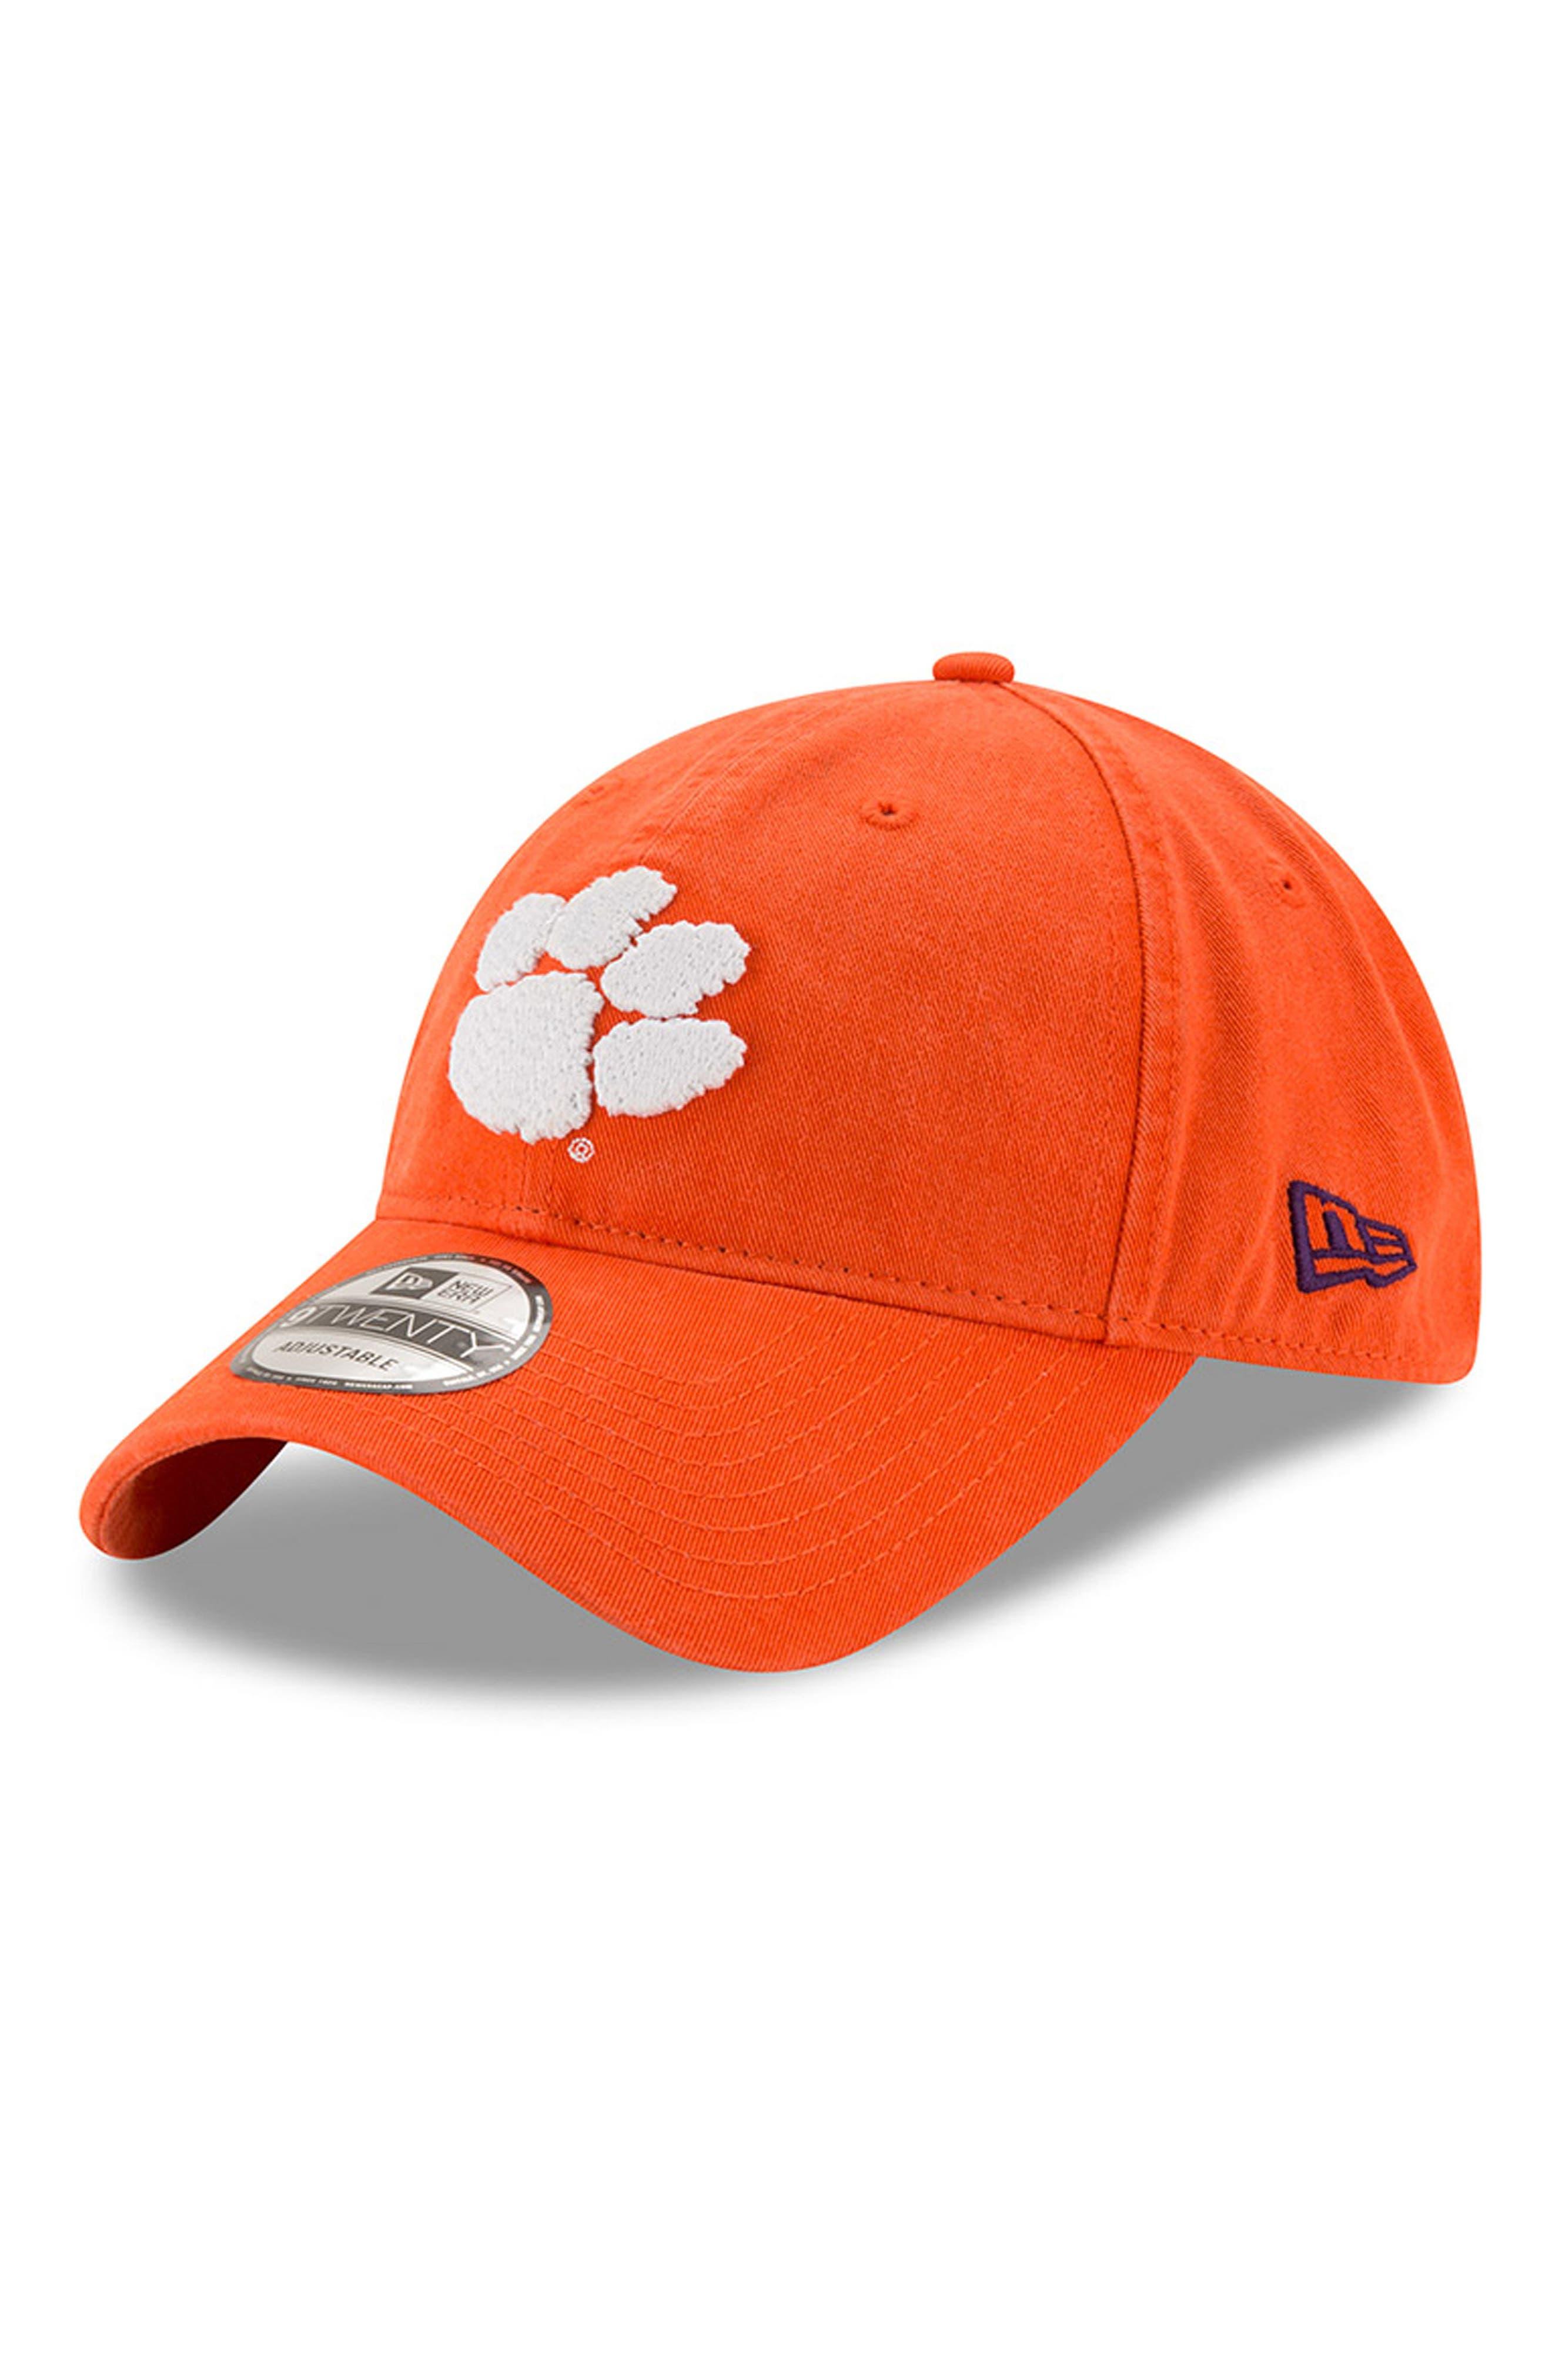 New Era Collegiate Core Classic - Clemson Tigers Baseball Cap,                             Main thumbnail 1, color,